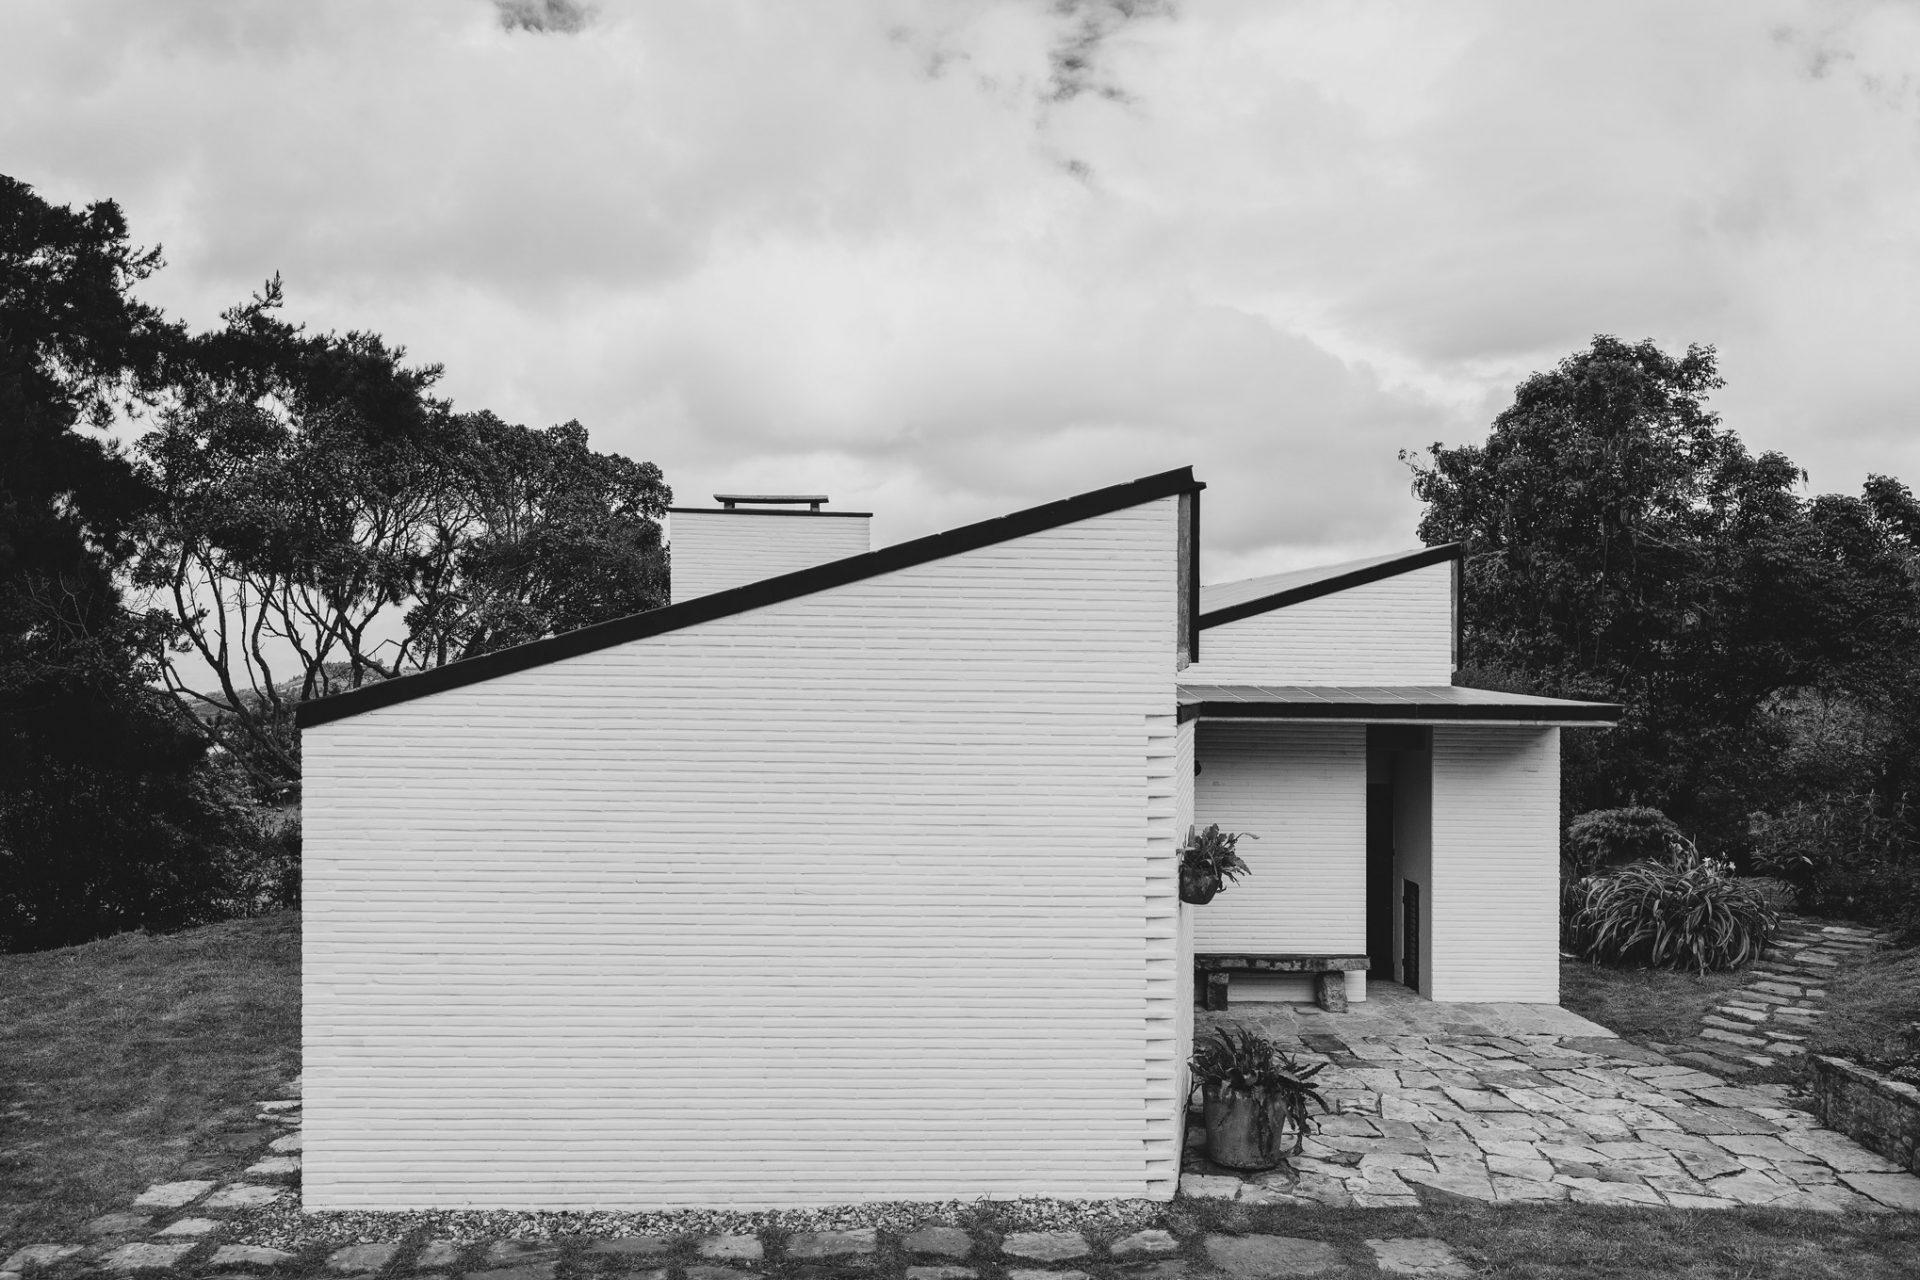 04-oberleander.lucas.simon.bosch.photography.colombia.bogota.arquitectura.diseño.fotografia